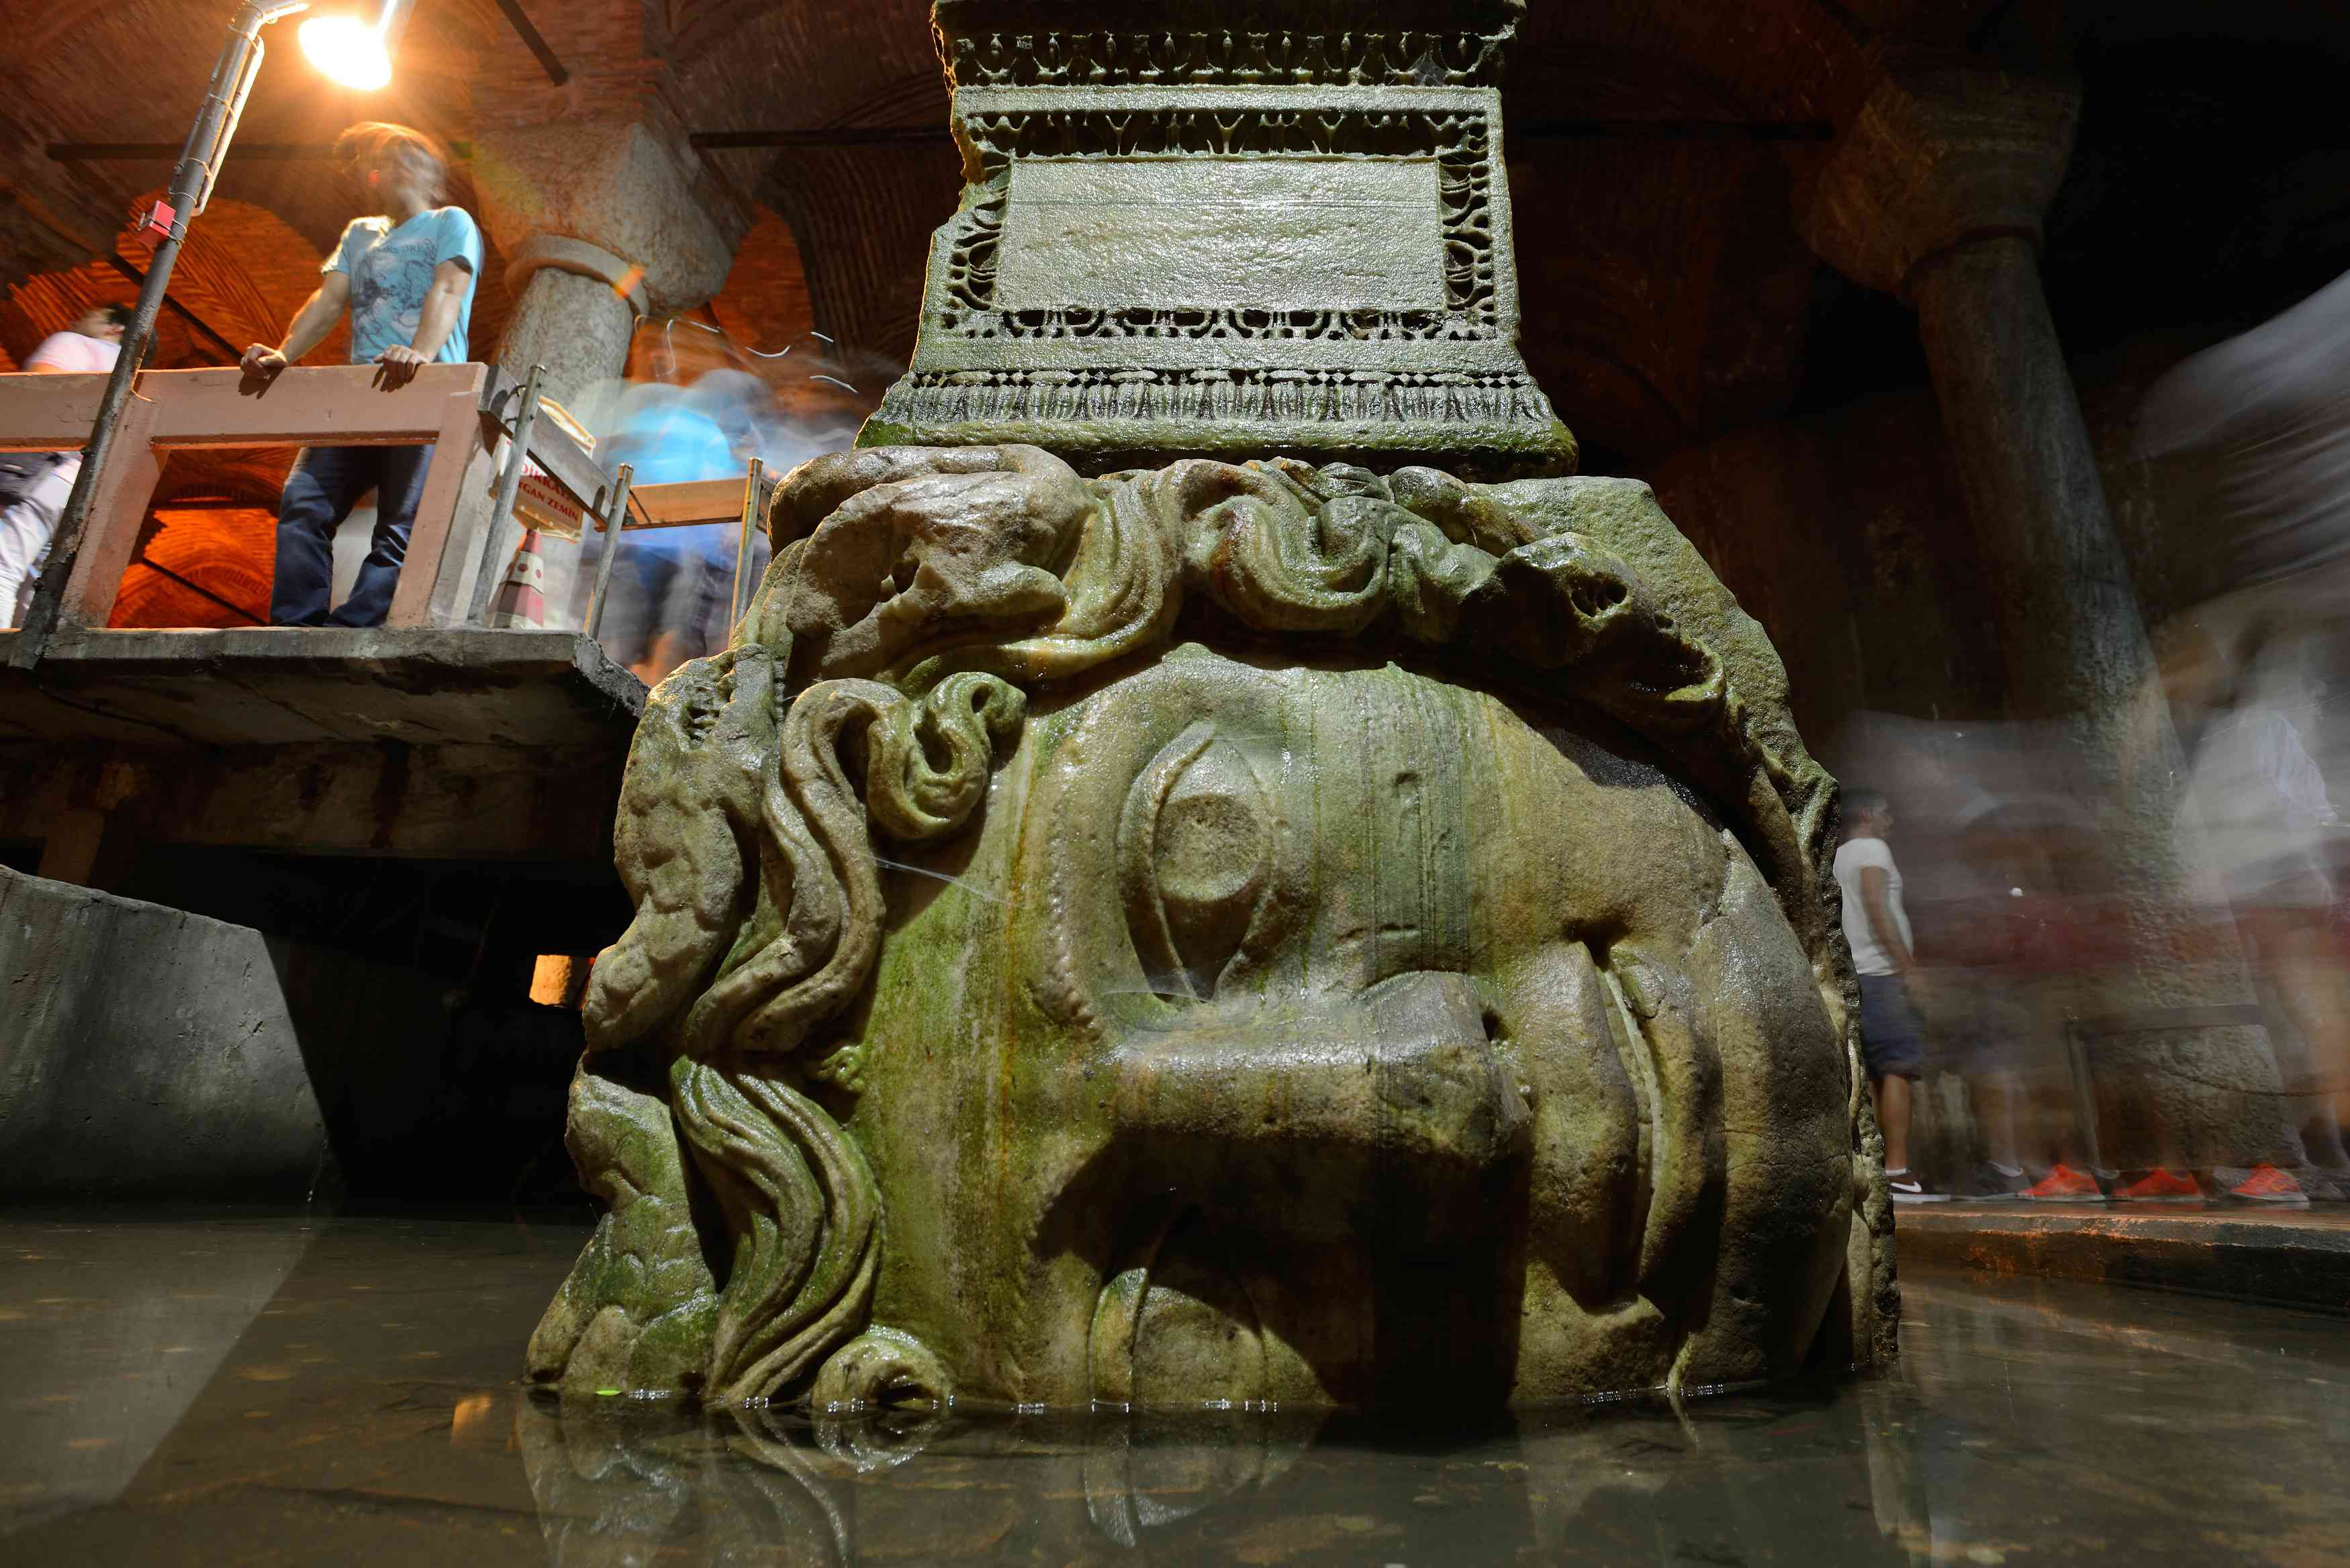 Medusa Head at Yerebatan Sarayi Cistern in Istanbul.